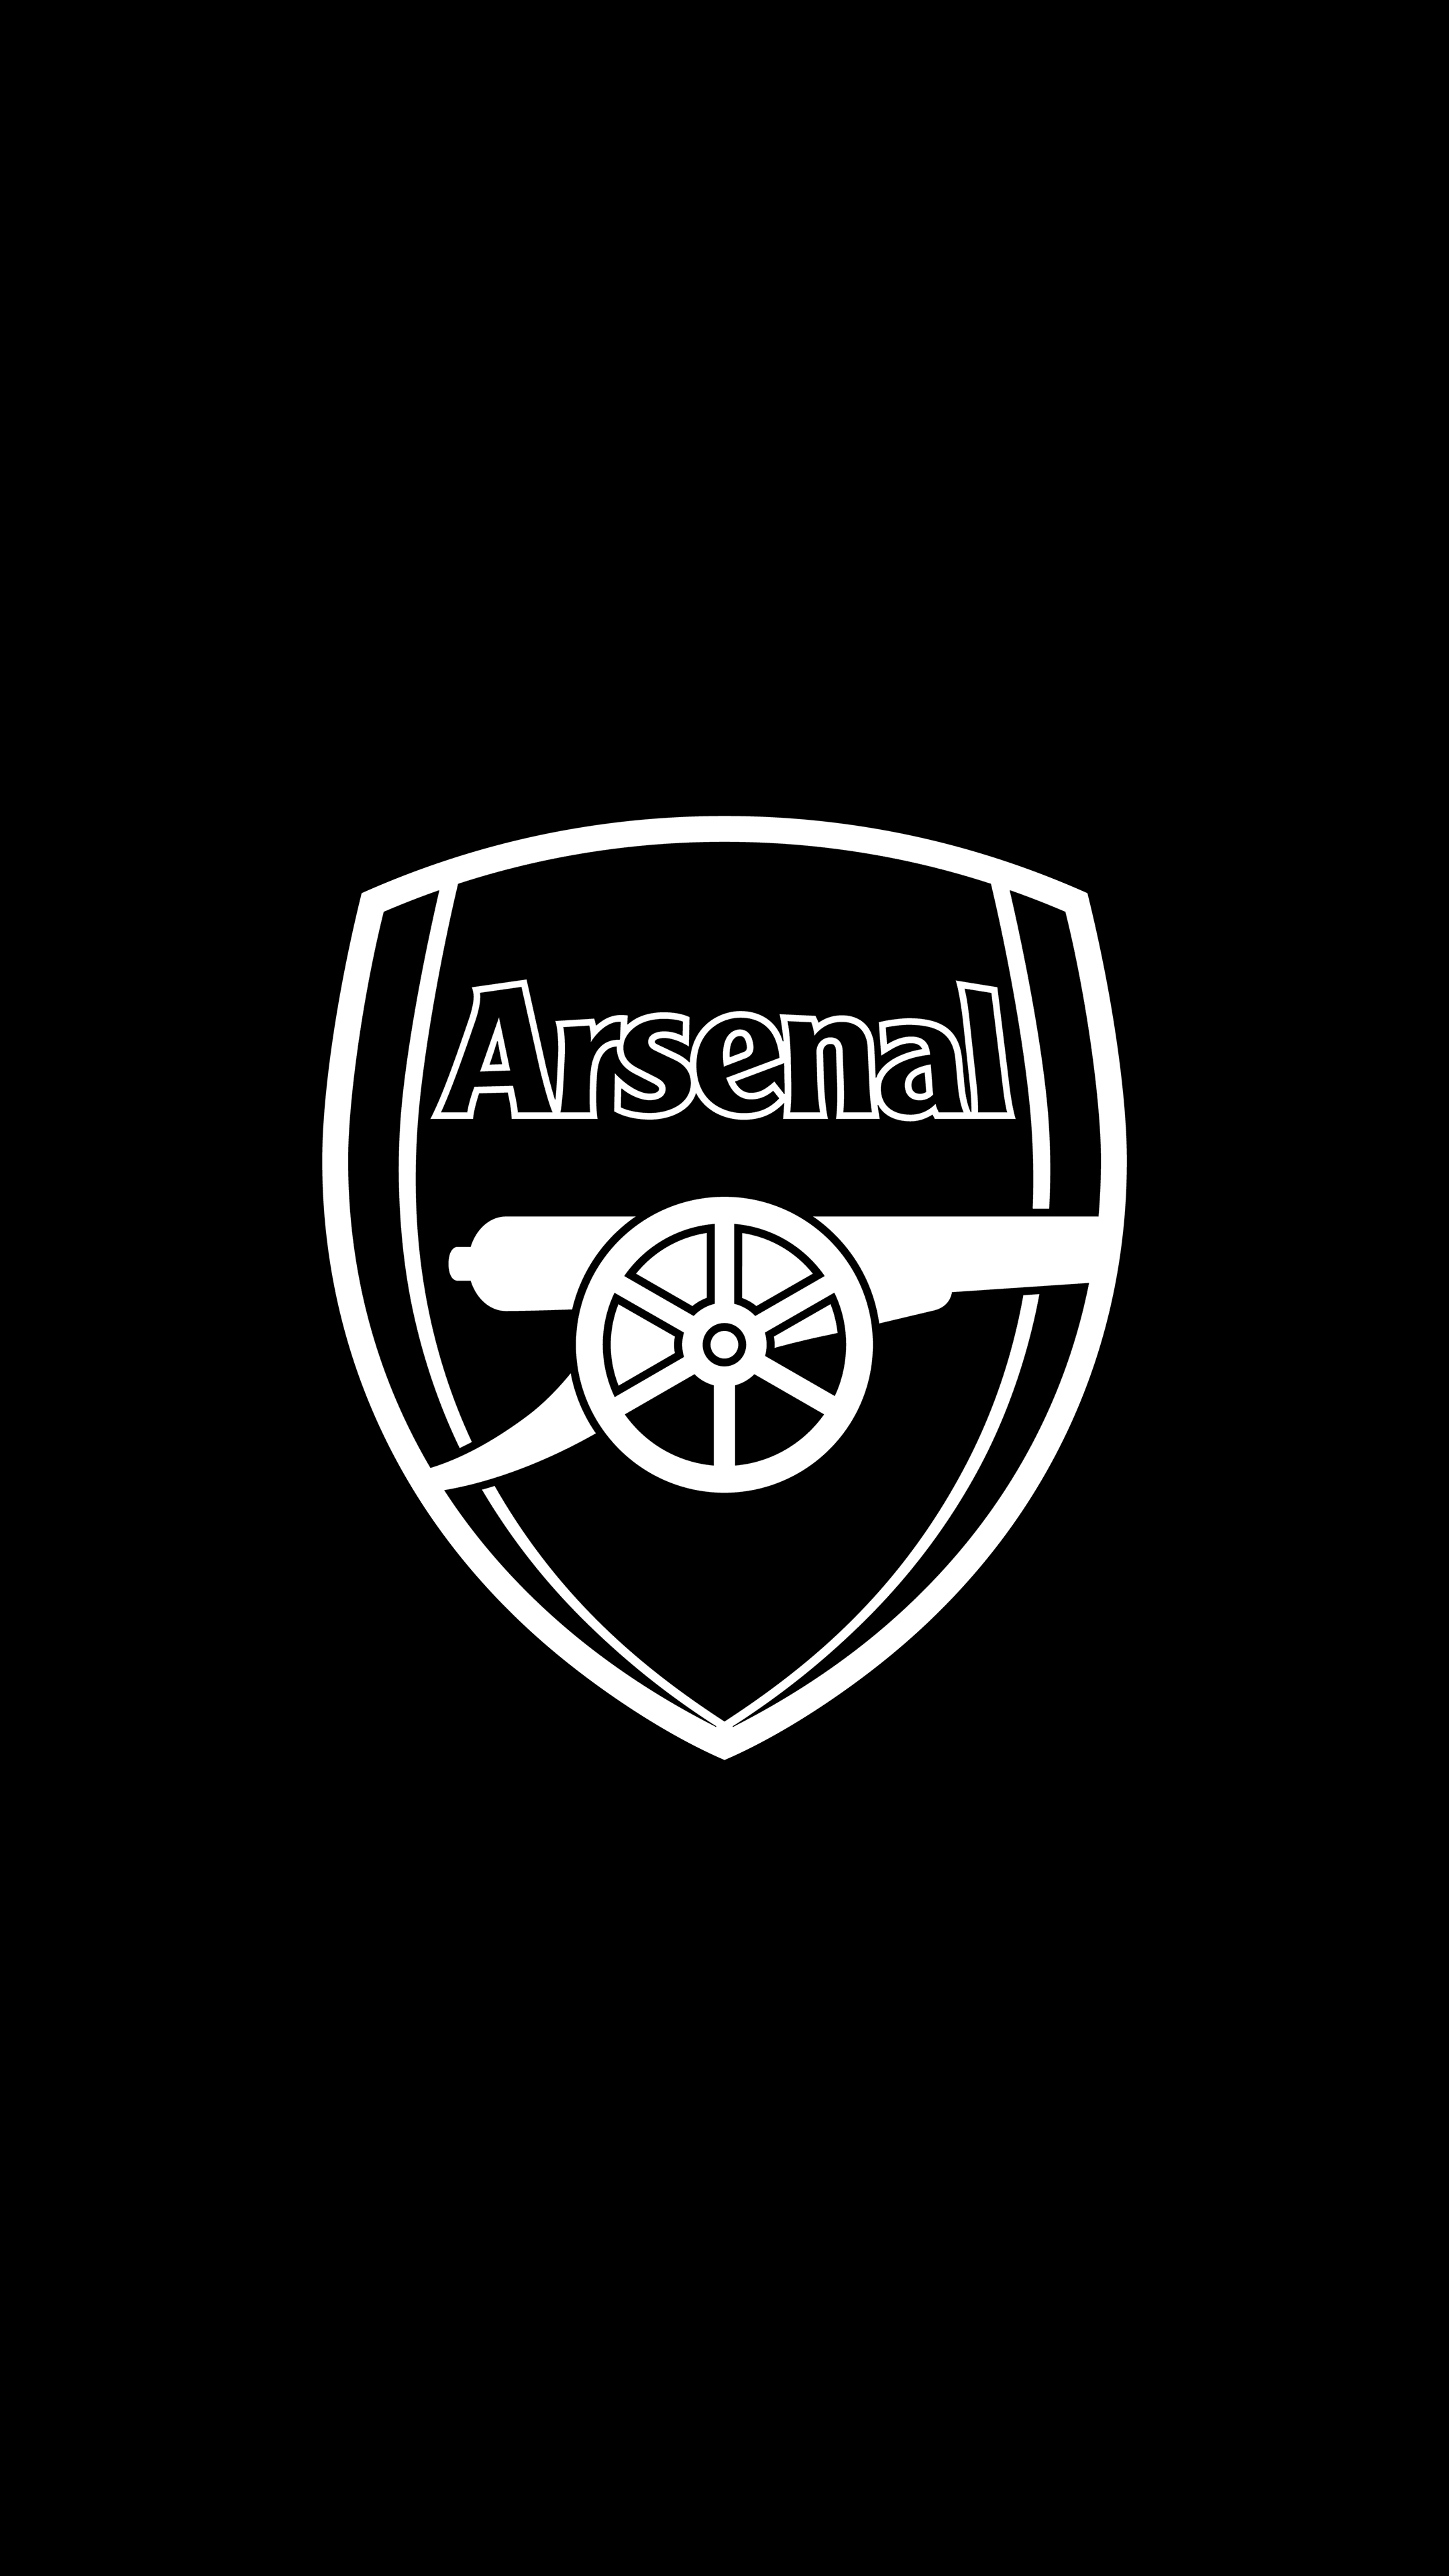 logo arsenal fc wallpaper